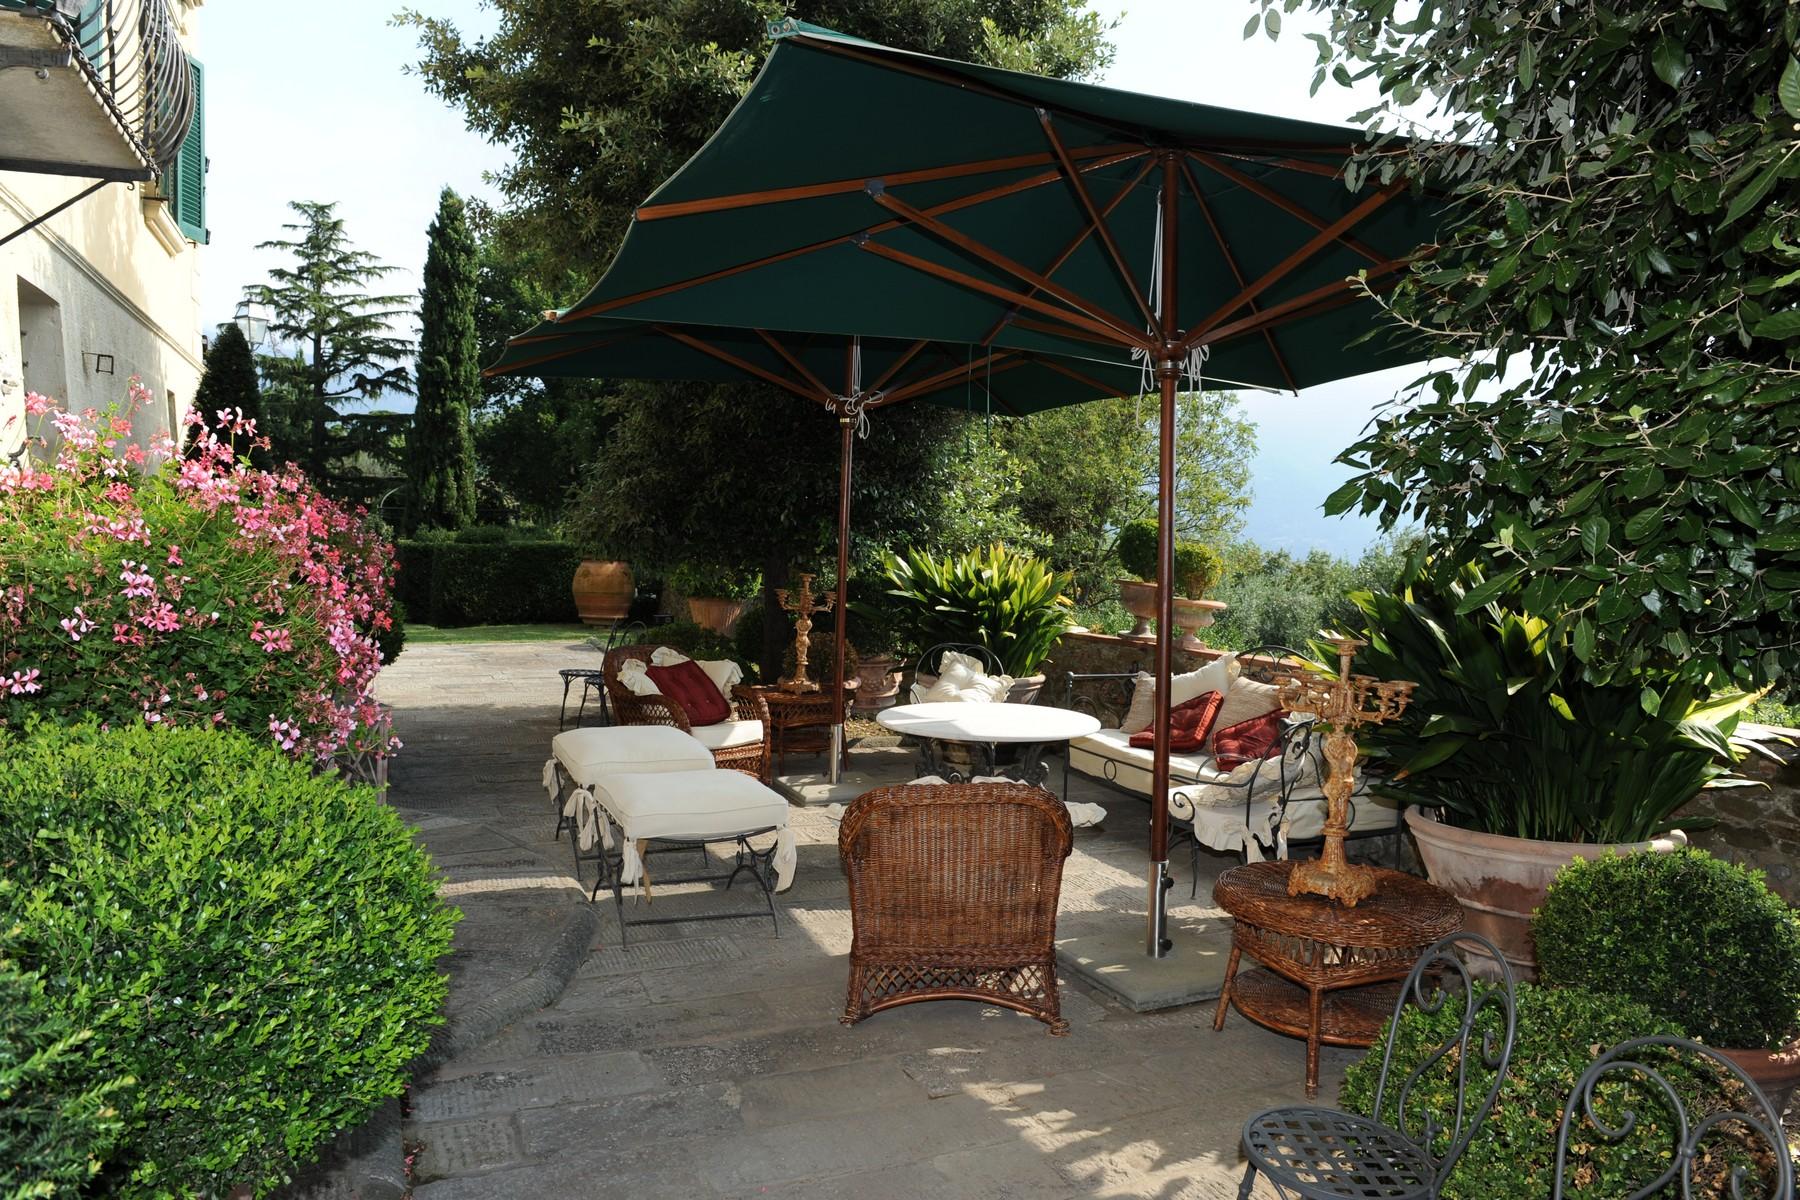 Villa in Vendita a Camaiore: 5 locali, 900 mq - Foto 13